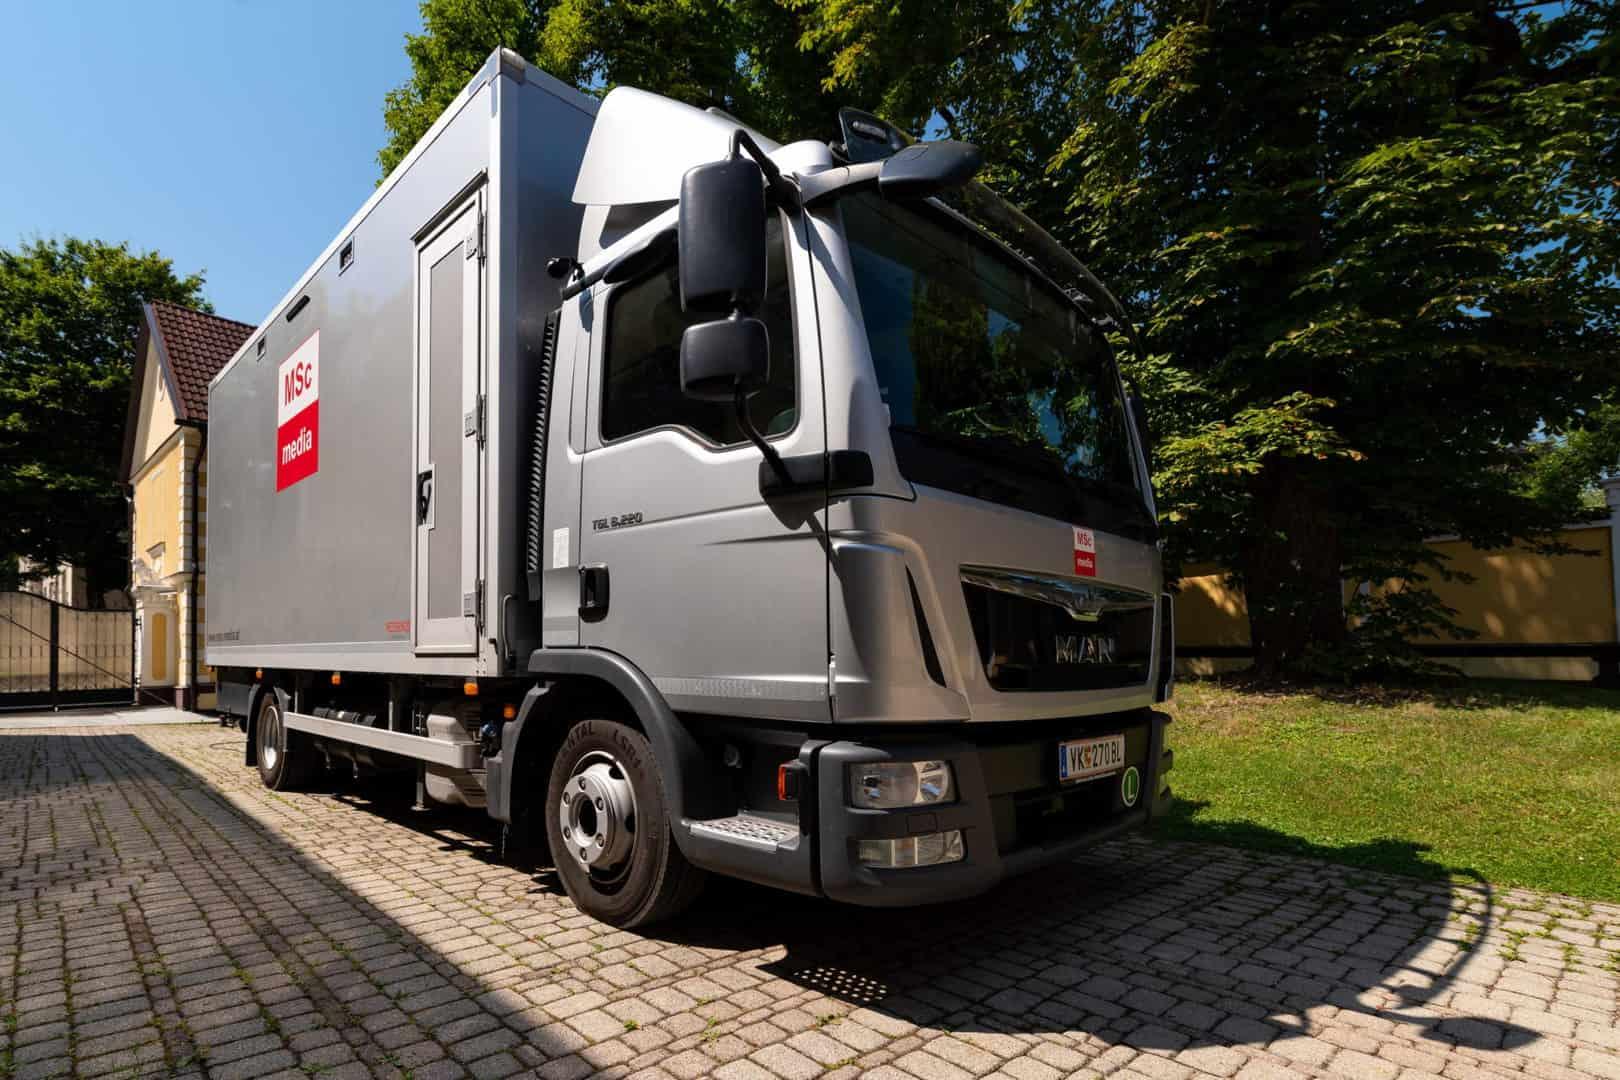 Mobiler Aufnahmewagen (Fotos: MSc Media & Management GmbH)